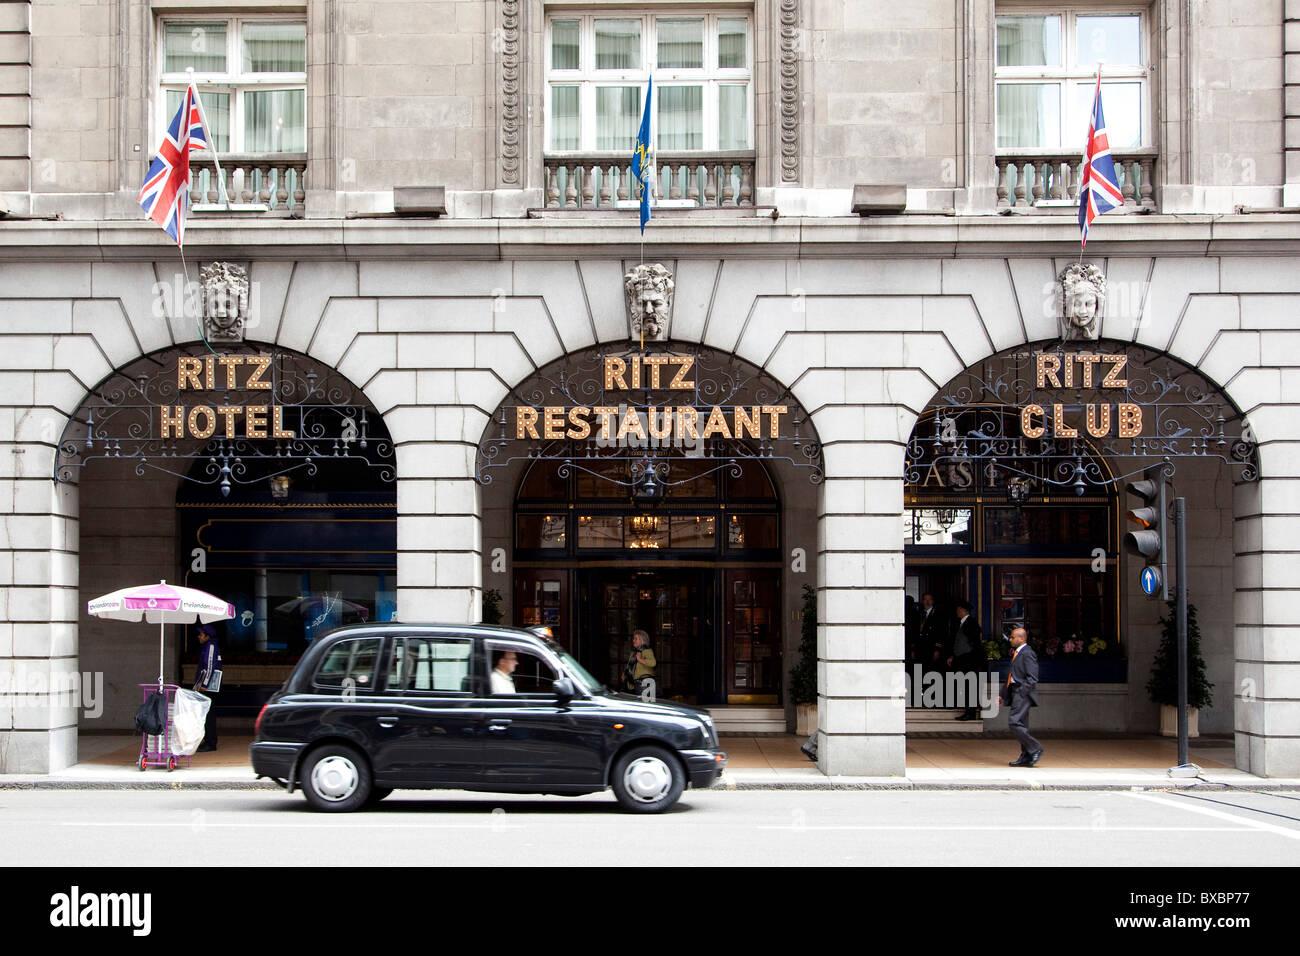 The Ritz Hotel in London, England, United Kingdom, Europe - Stock Image